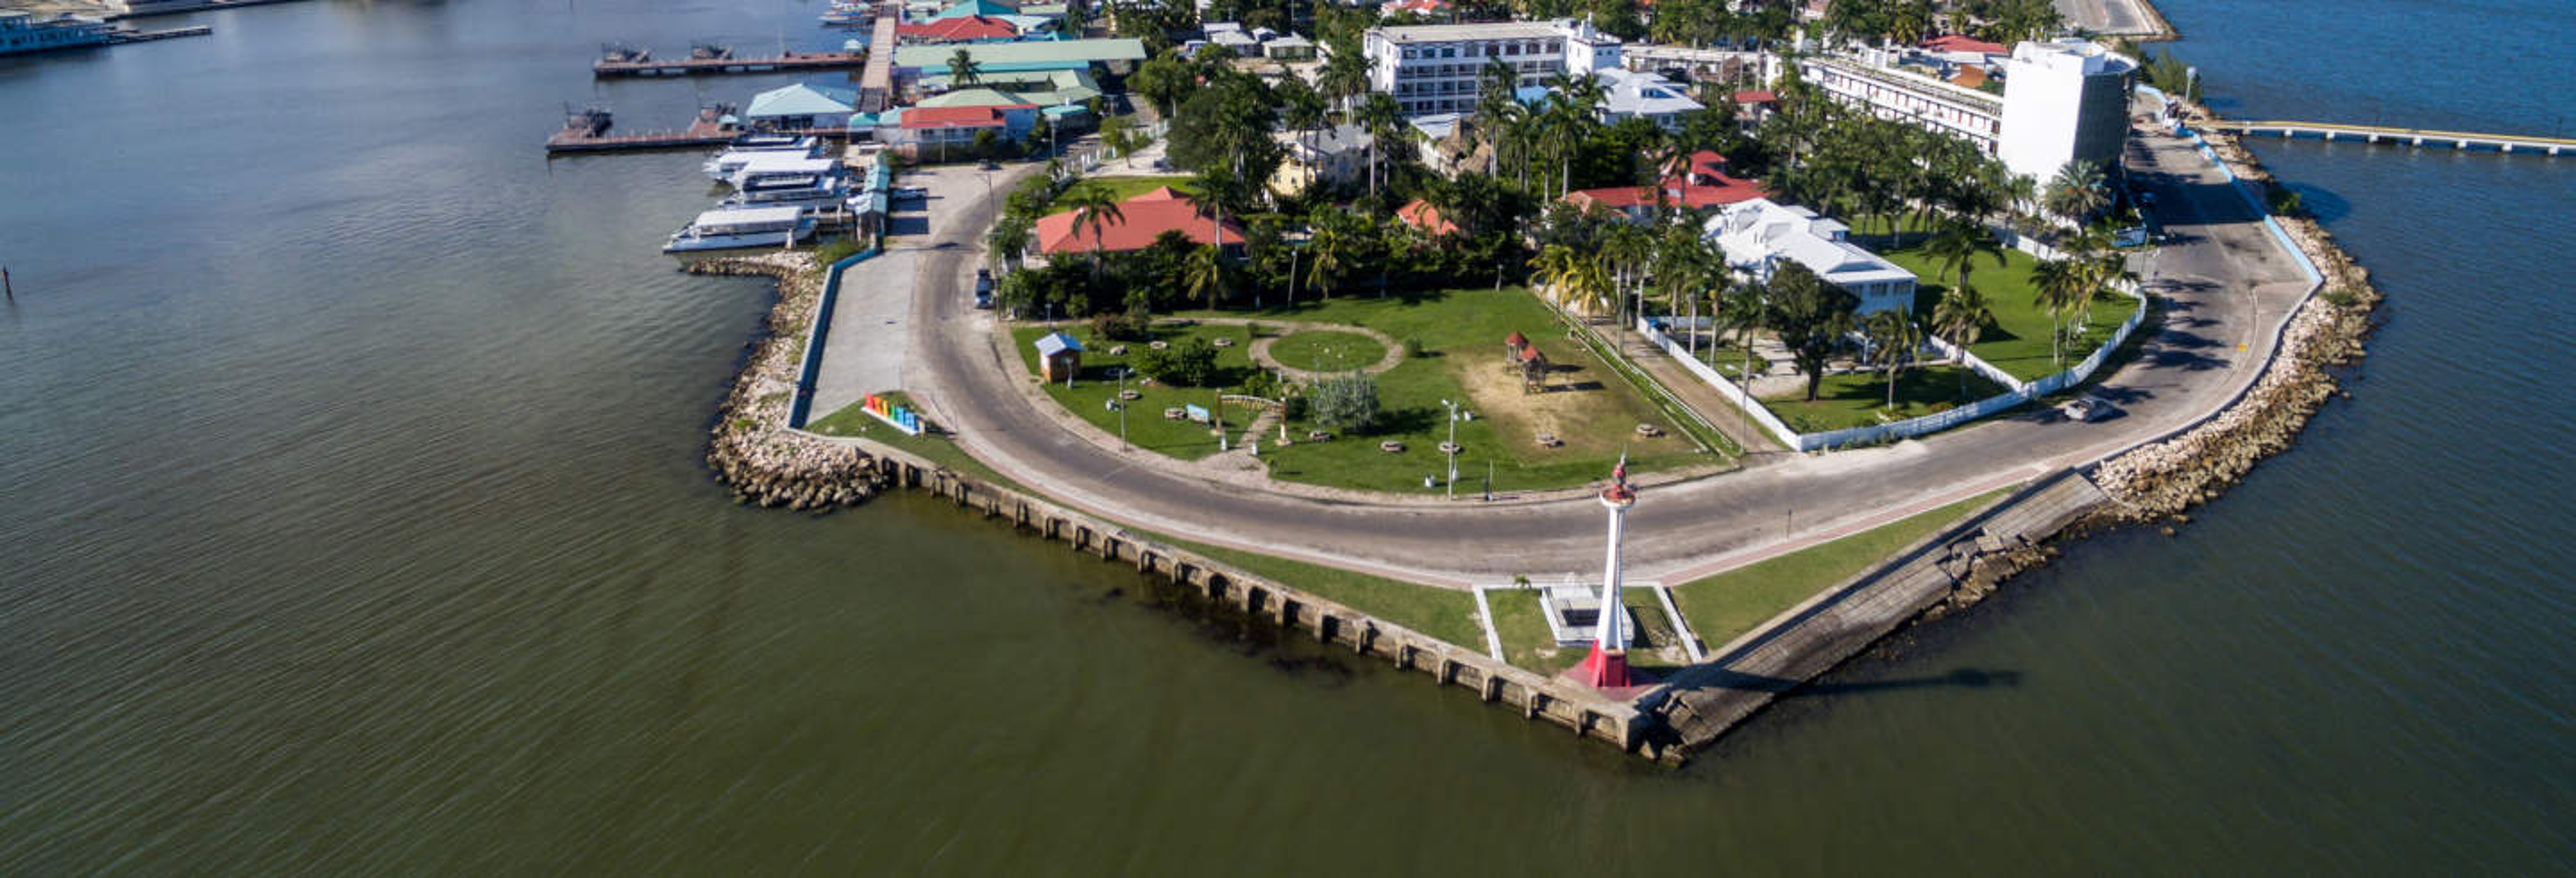 Tour di Belize City per croceristi